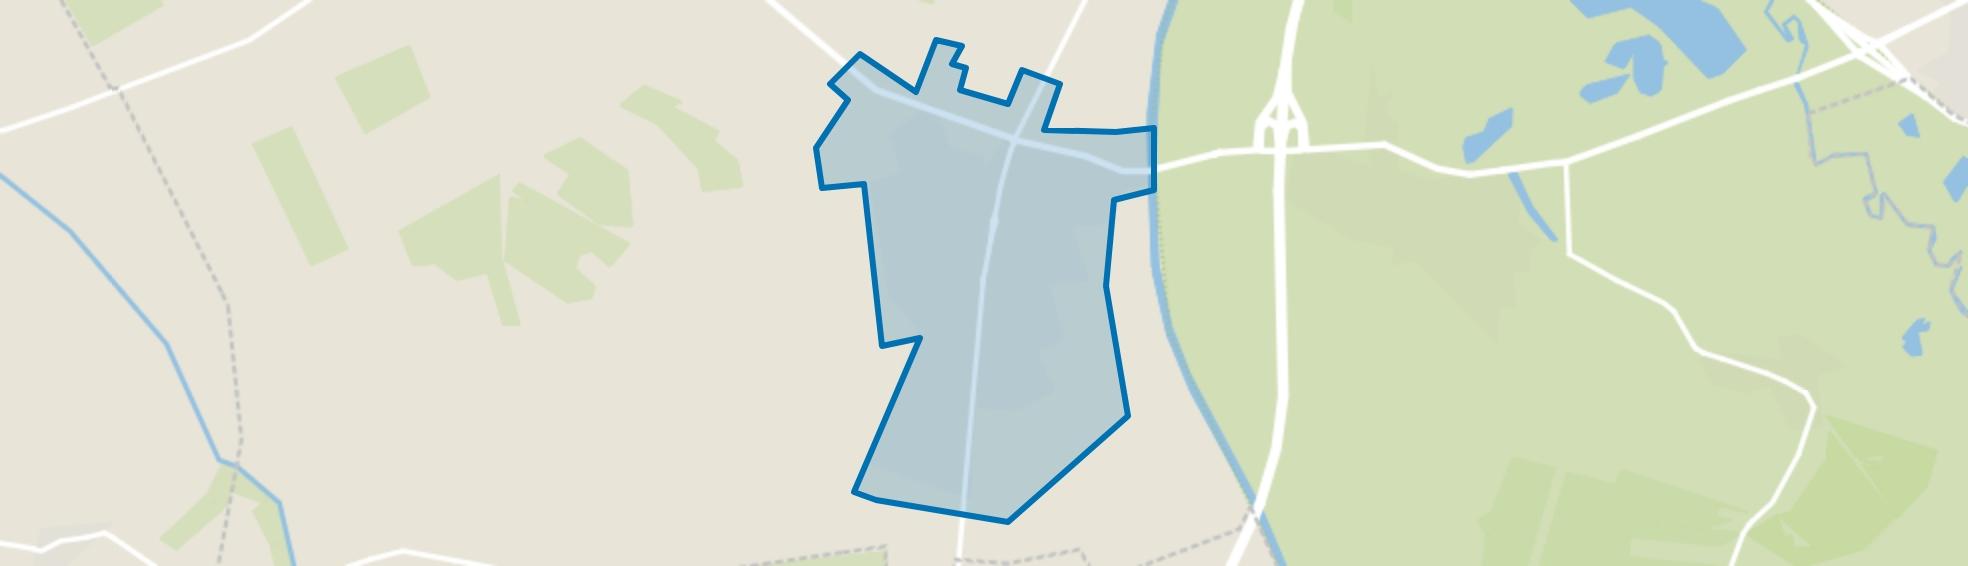 Vries, Vries map